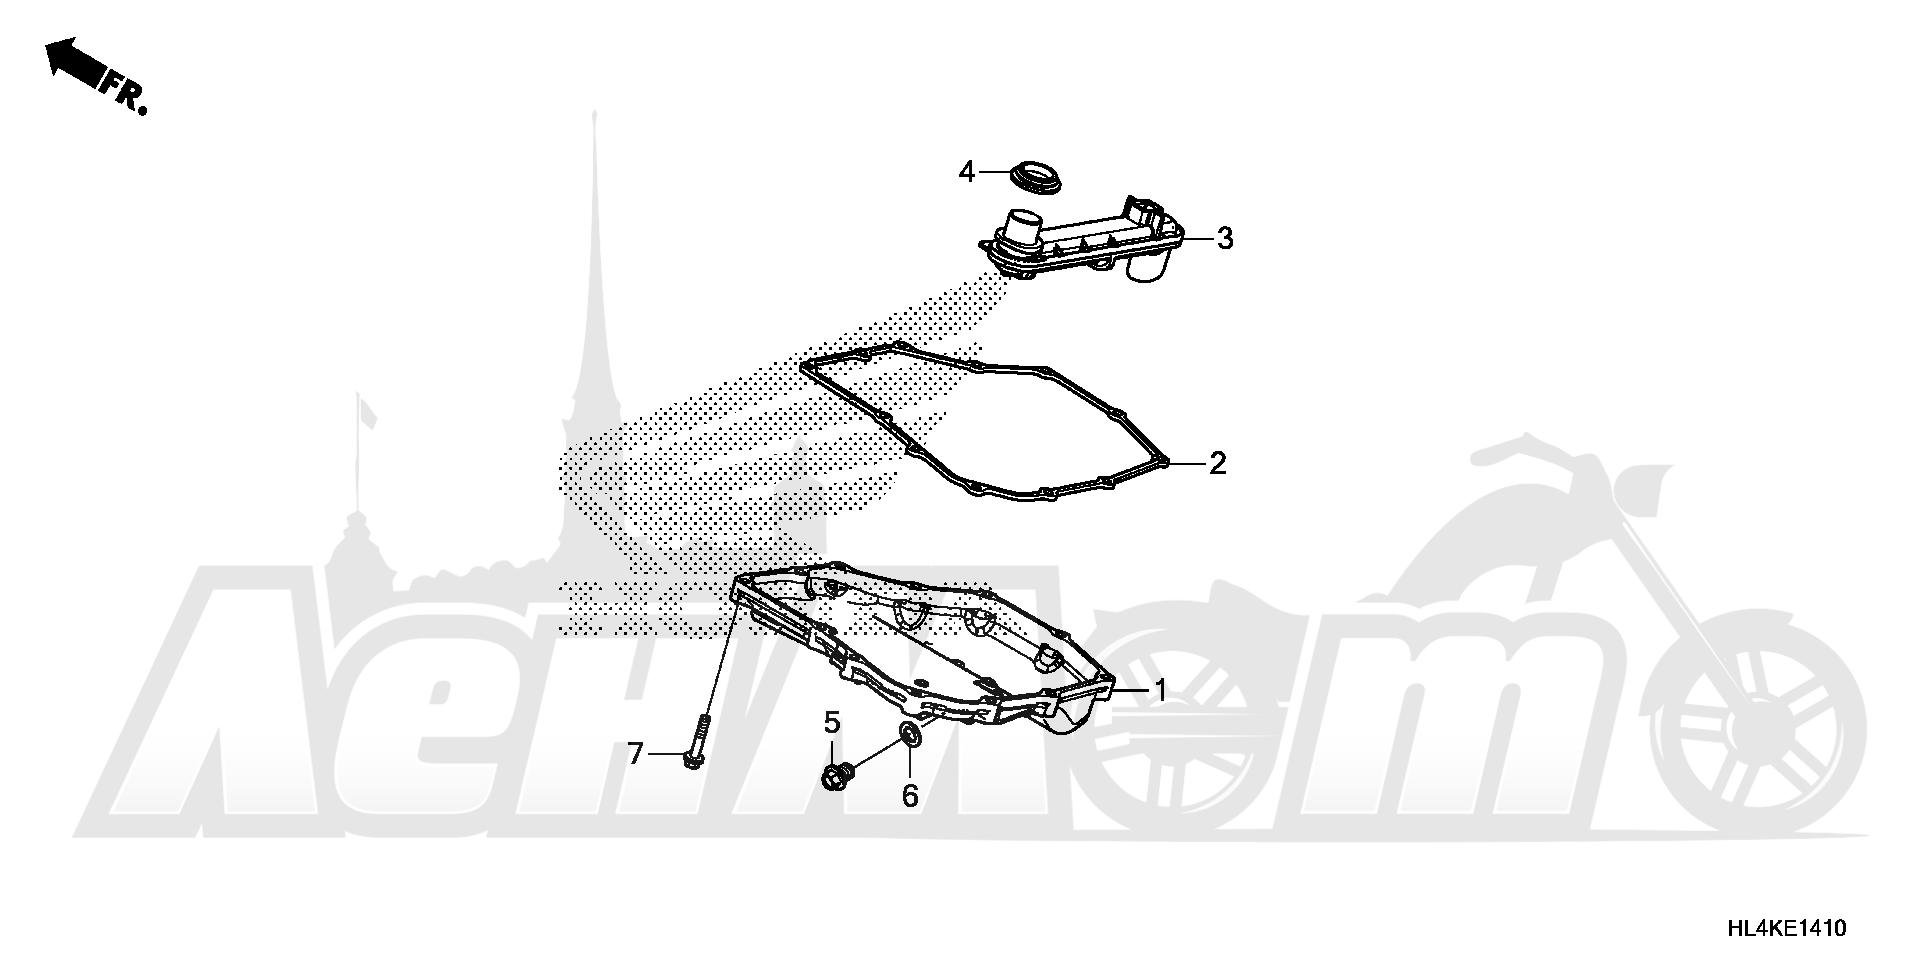 Запчасти для Квадроцикла Honda 2019 SXS1000M5L Раздел: OIL PAN   маслянный поддон